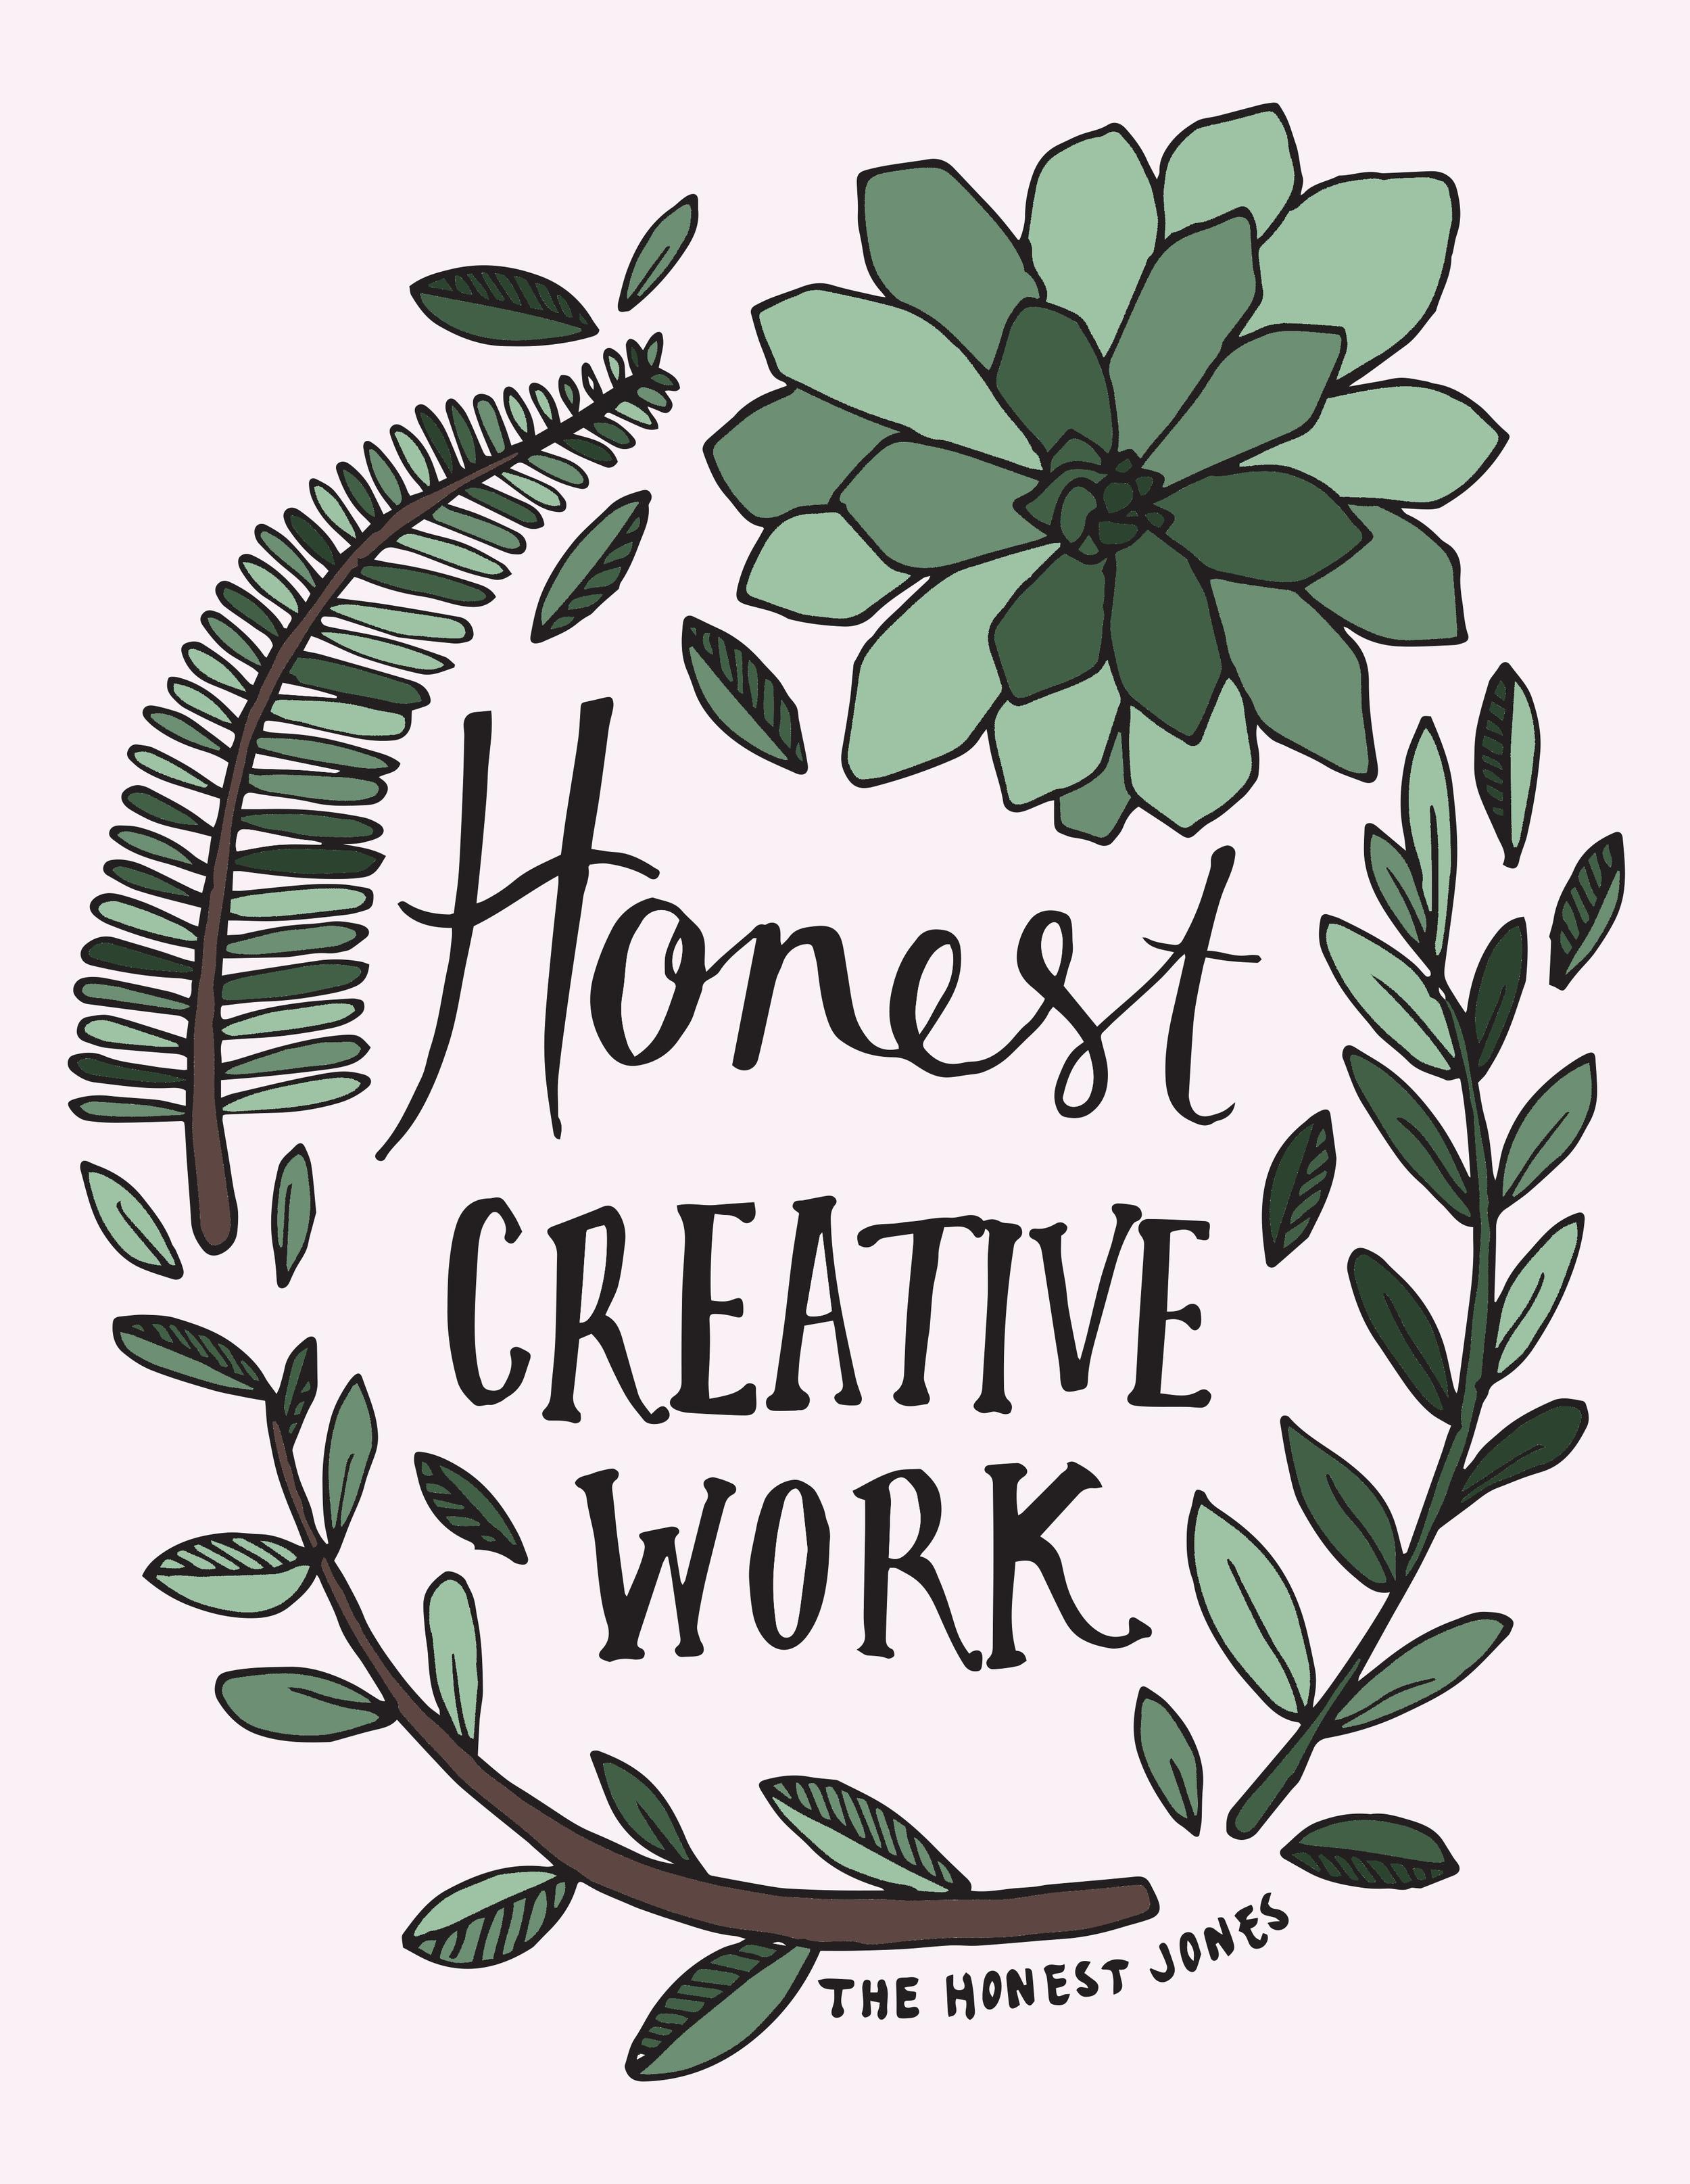 Illustration by Kate Baxter for The Honest Jones